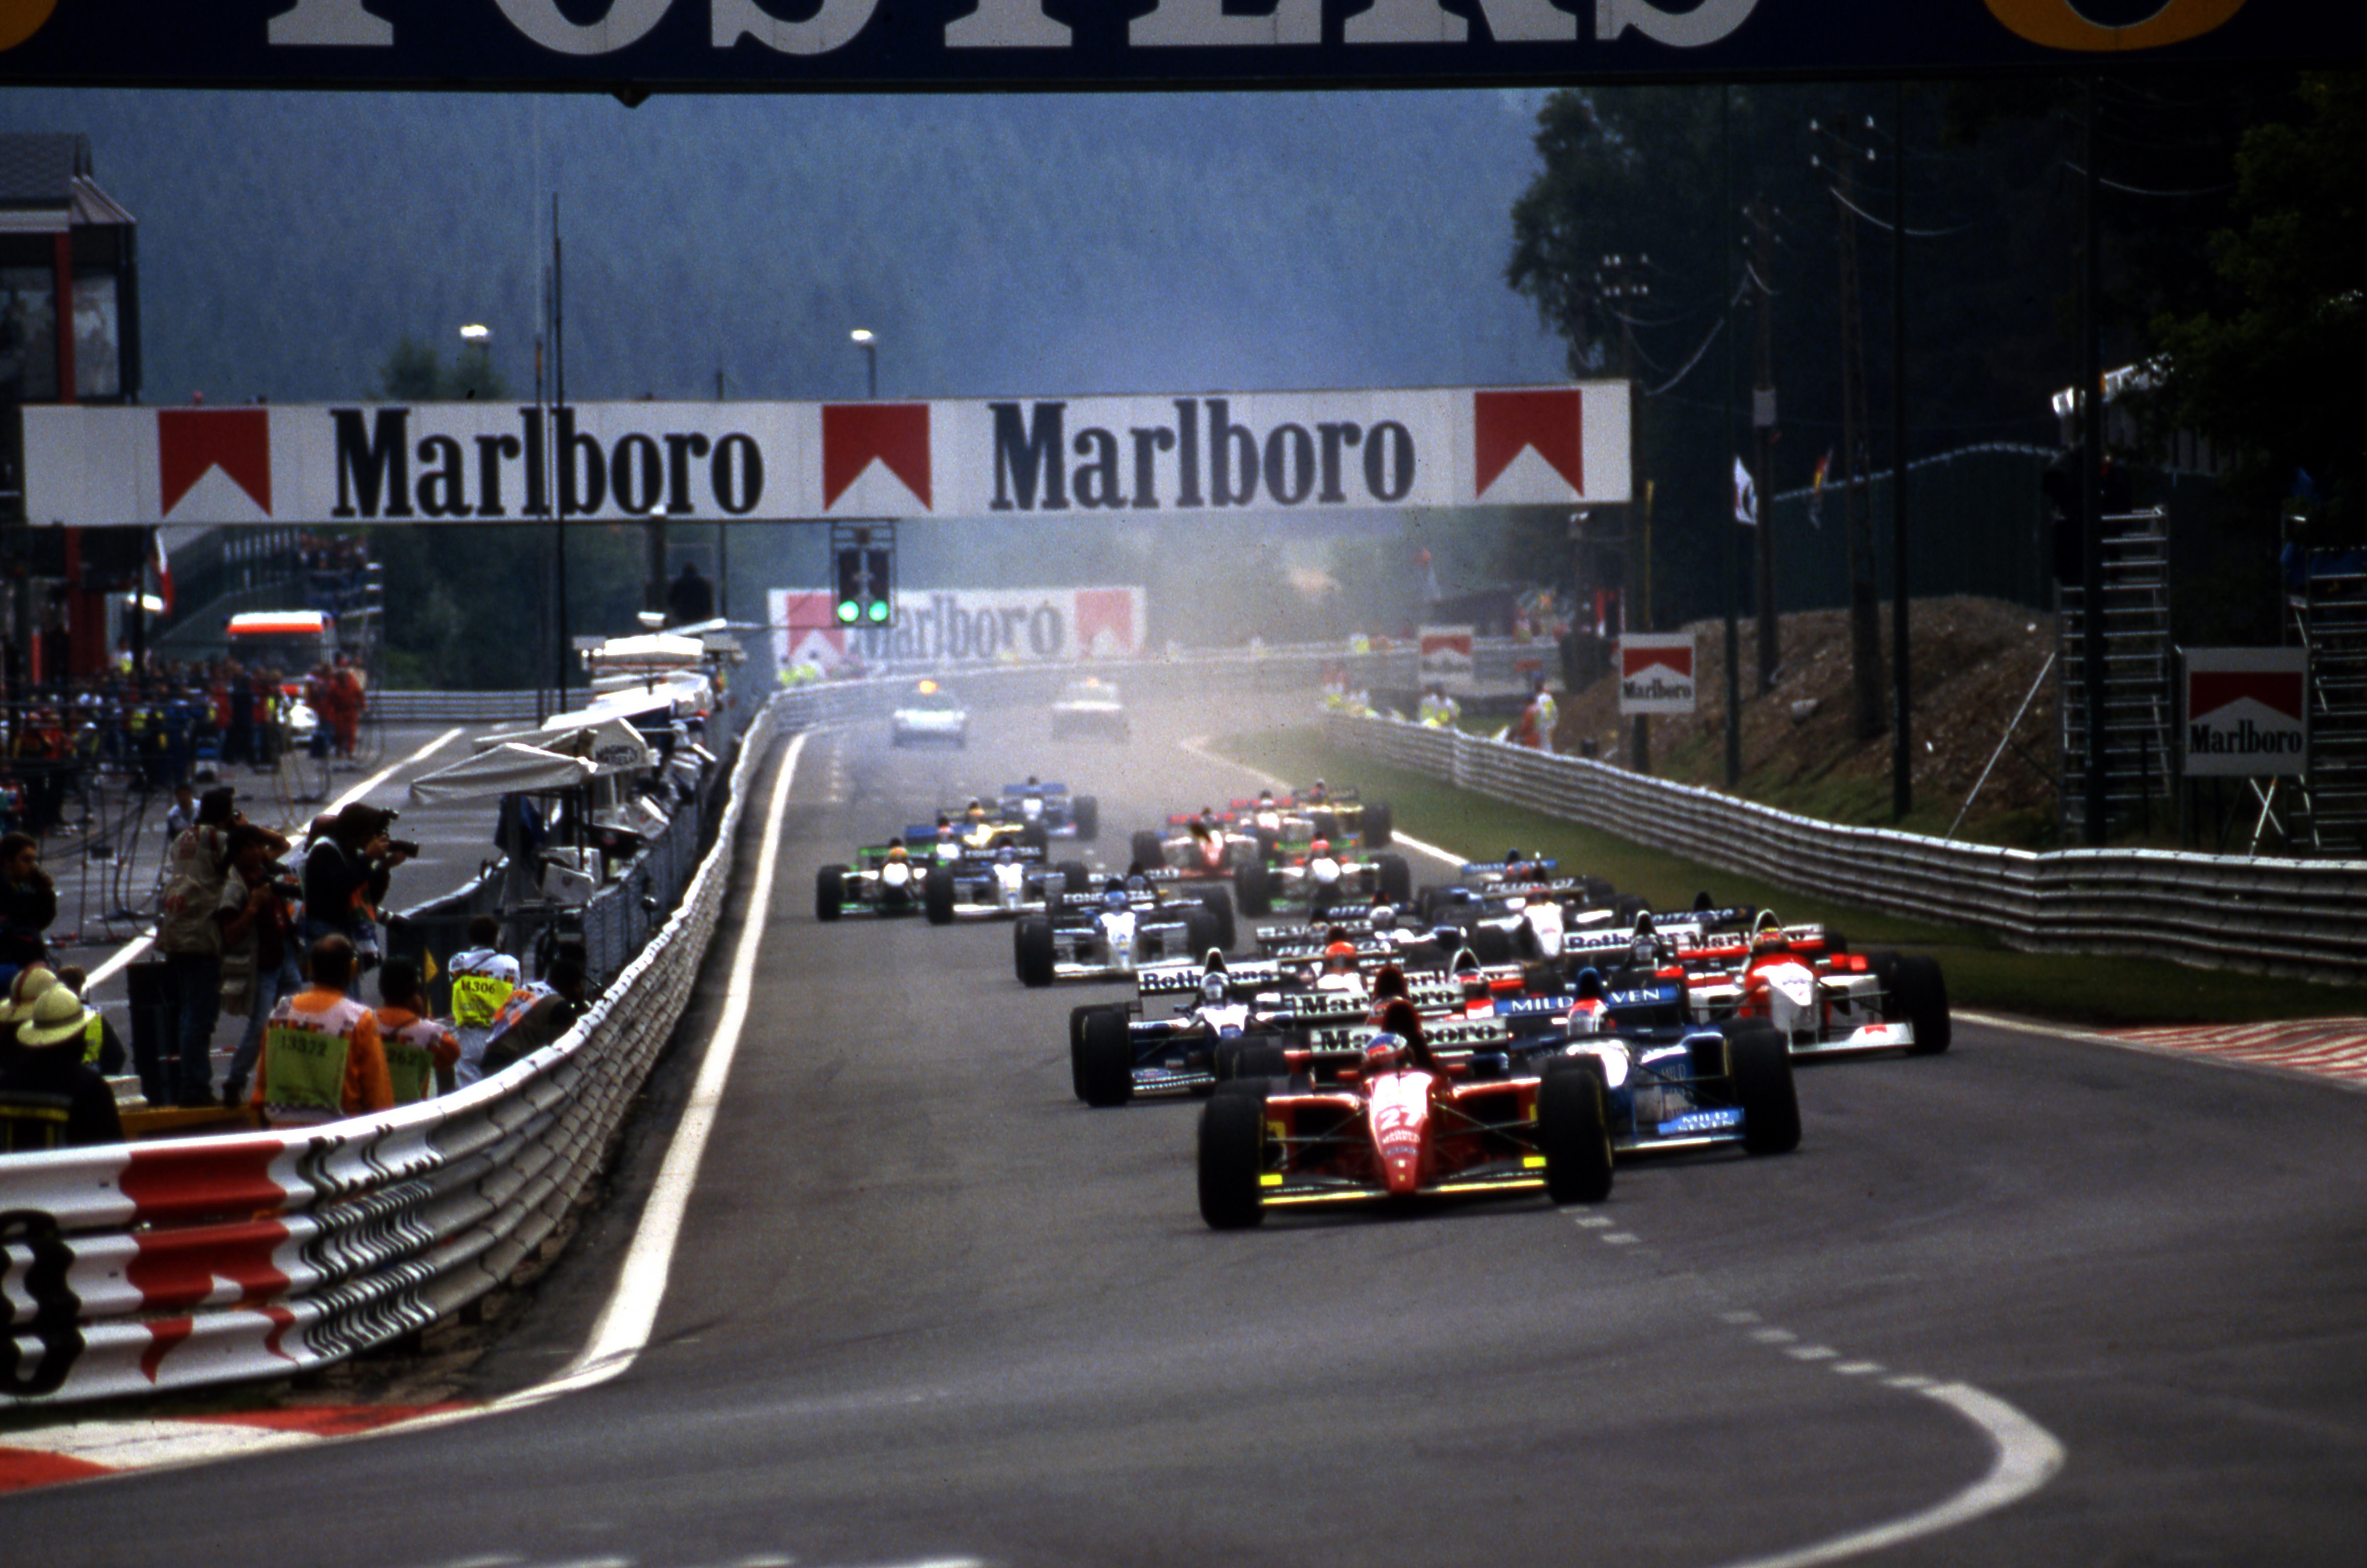 F1 1995, Belgian Grand Prix start